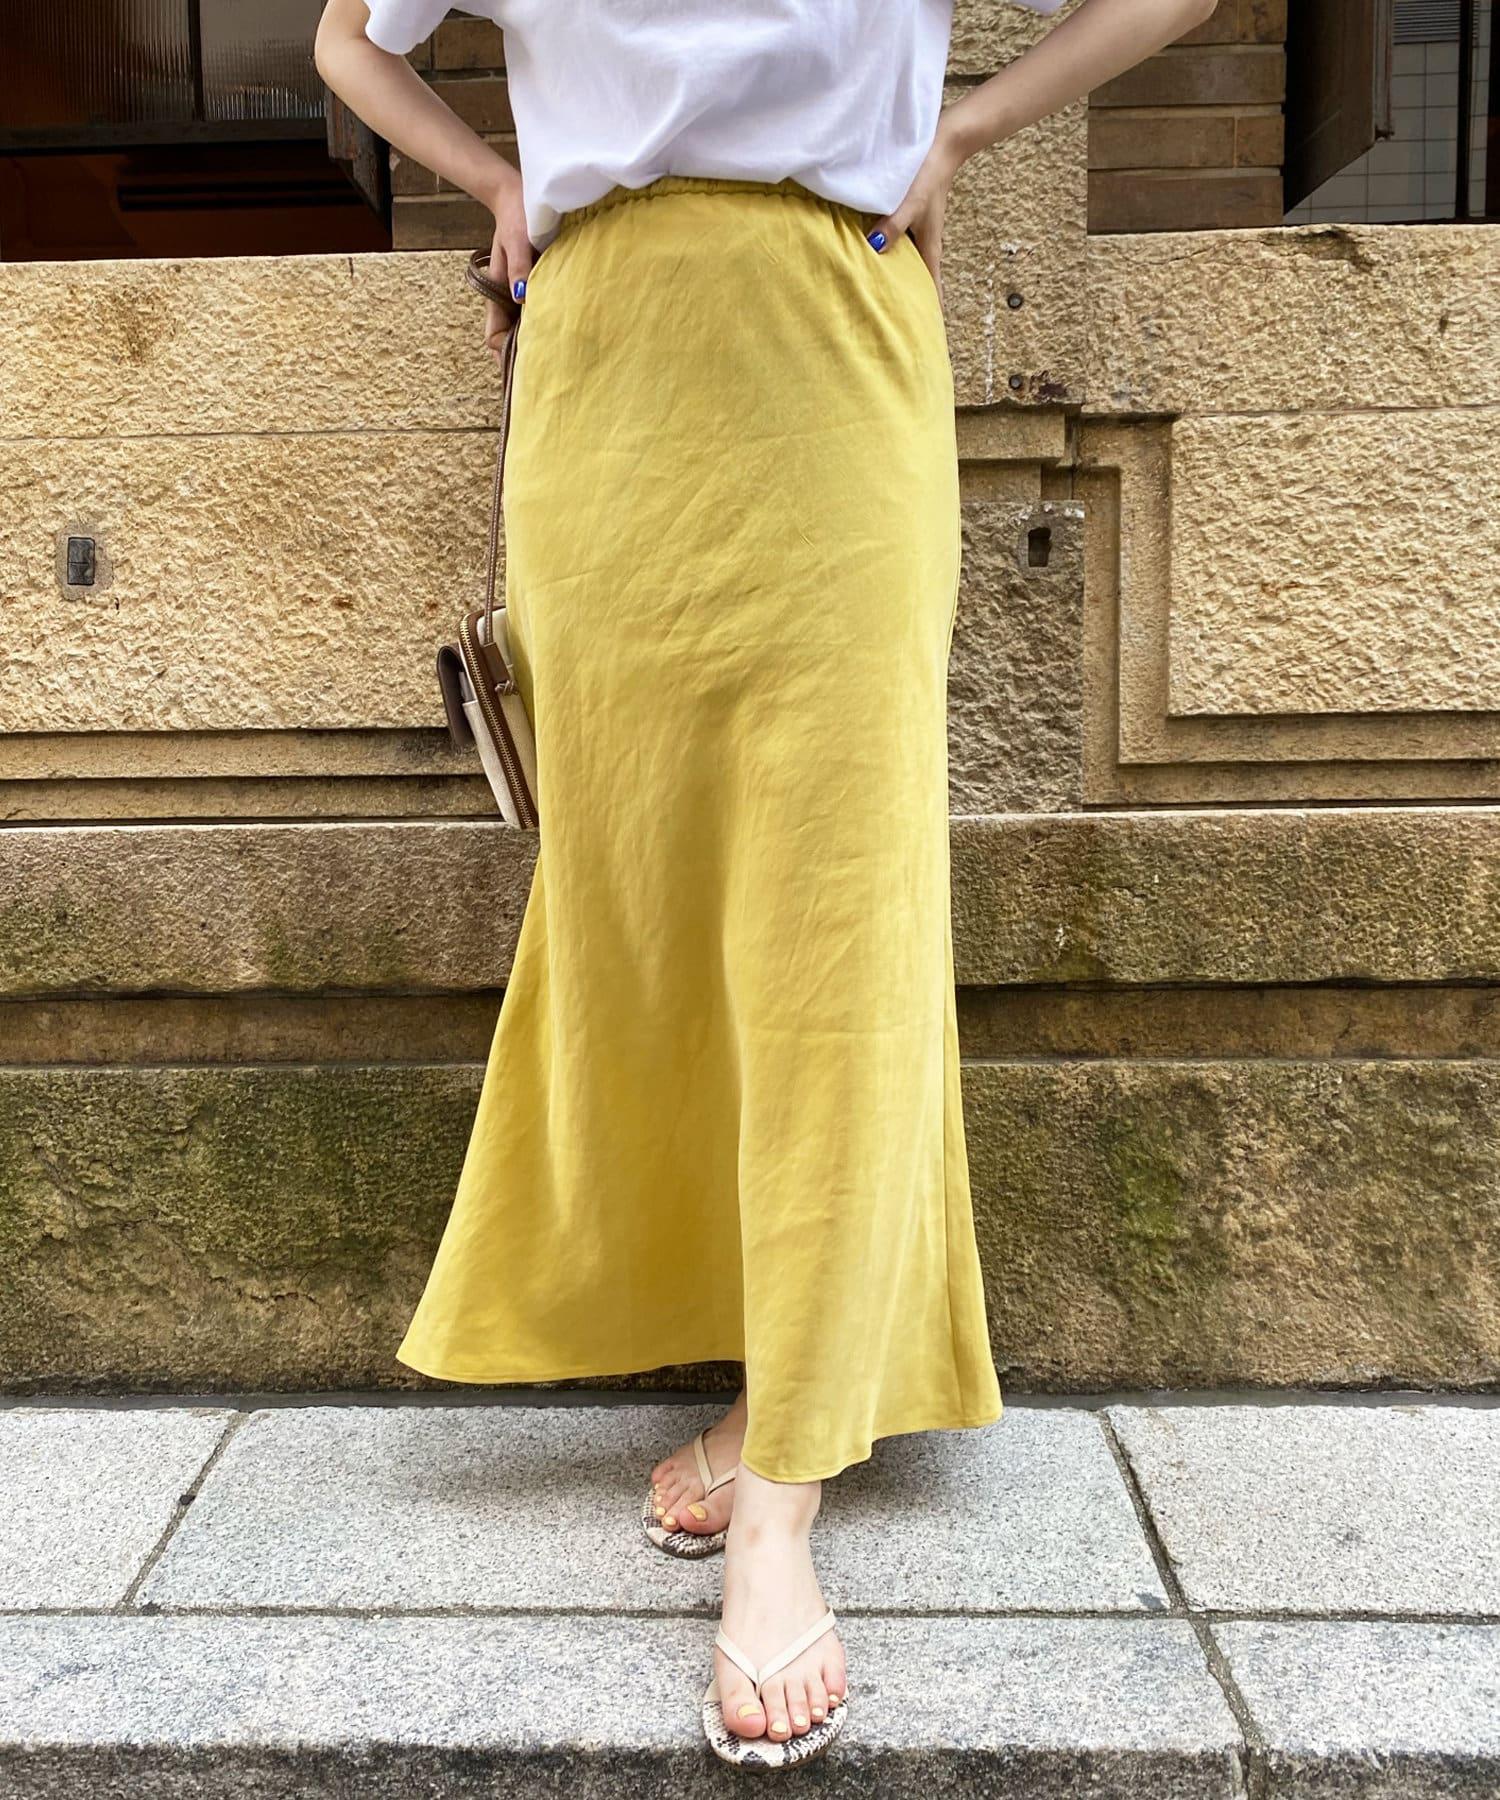 DOUDOU(ドゥドゥ) 【追加予約】【追加カラー】麻混ソフトマーメイドスカート